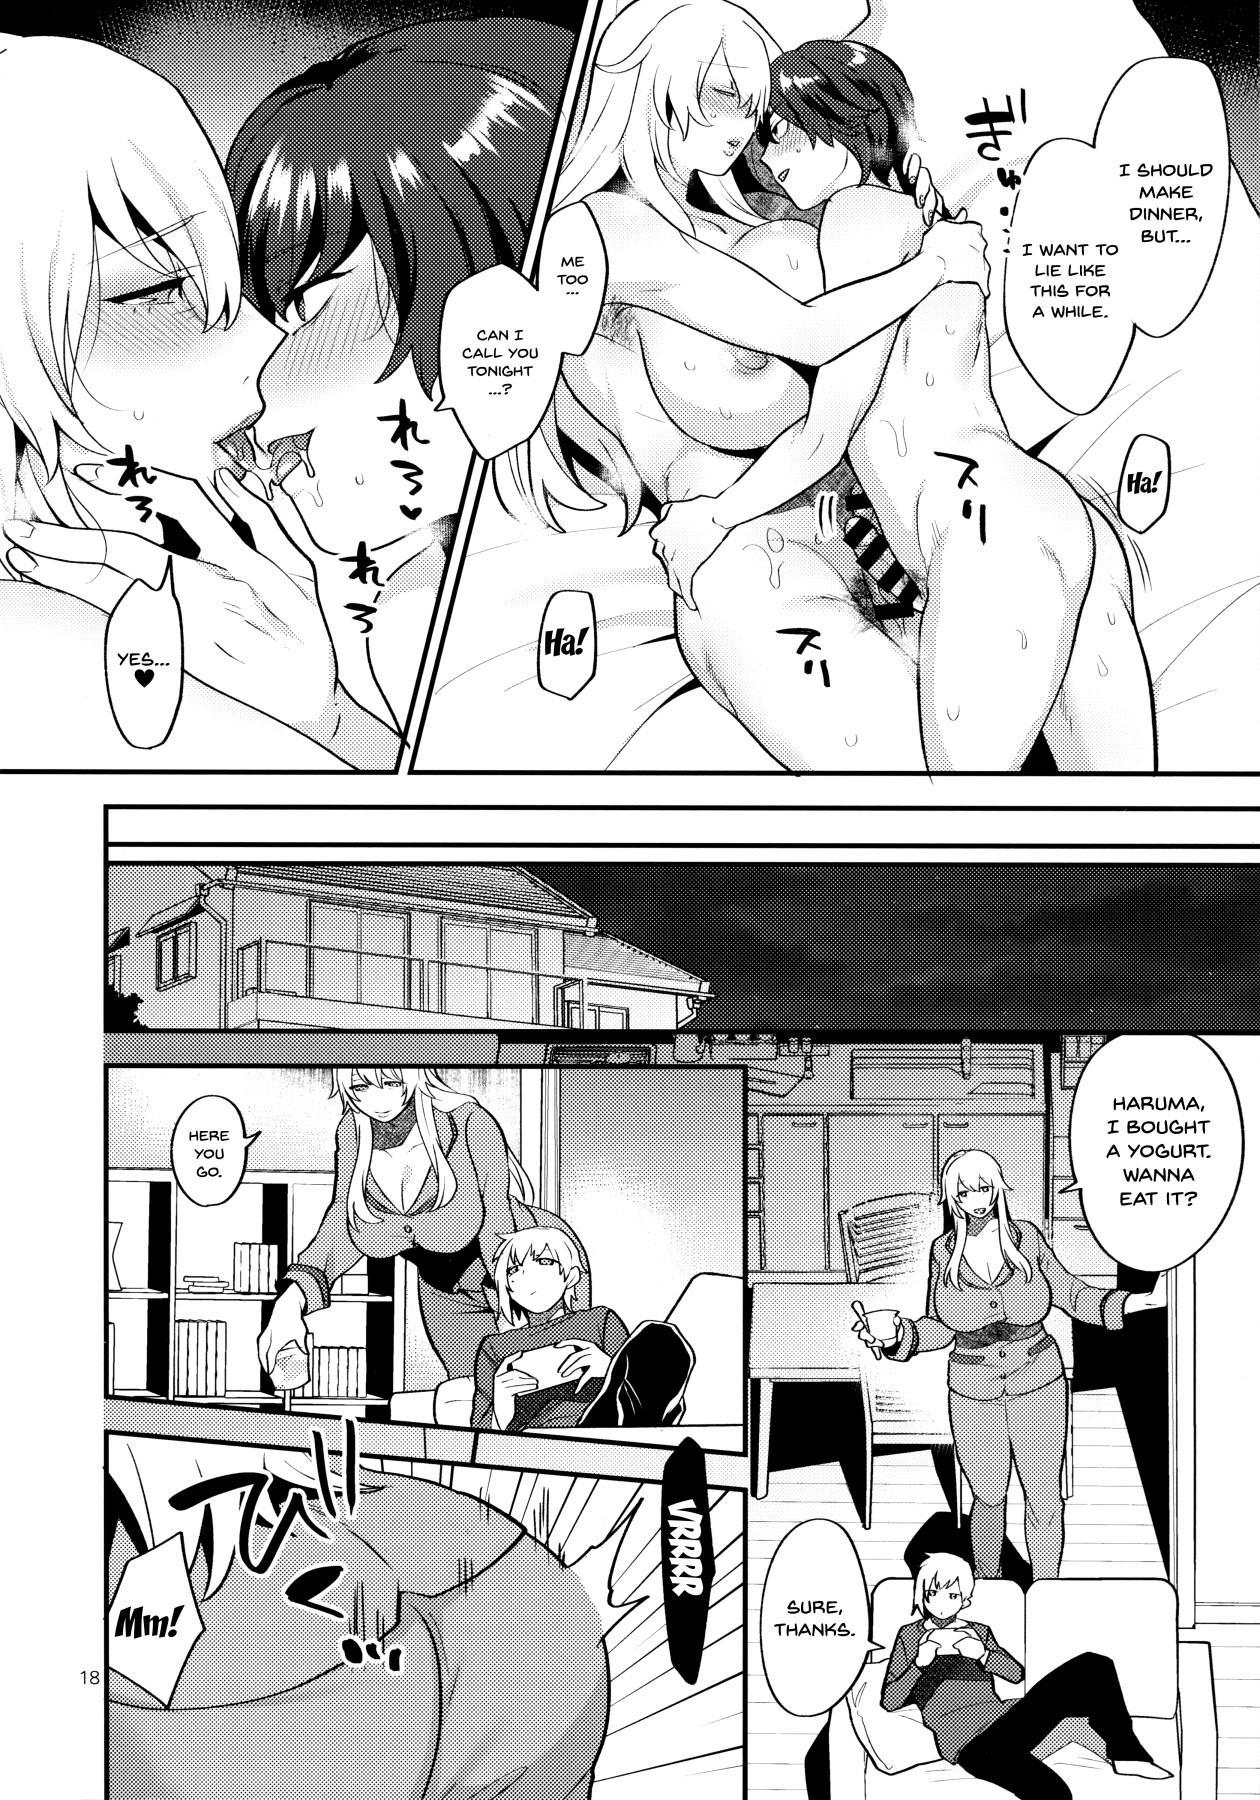 (C96) [Granada Sky (Mogiki Hayami)] Shemale Single Mother no Yukari-san | Shemale Single Mother Yukari-san [English] {Doujins.com} 16